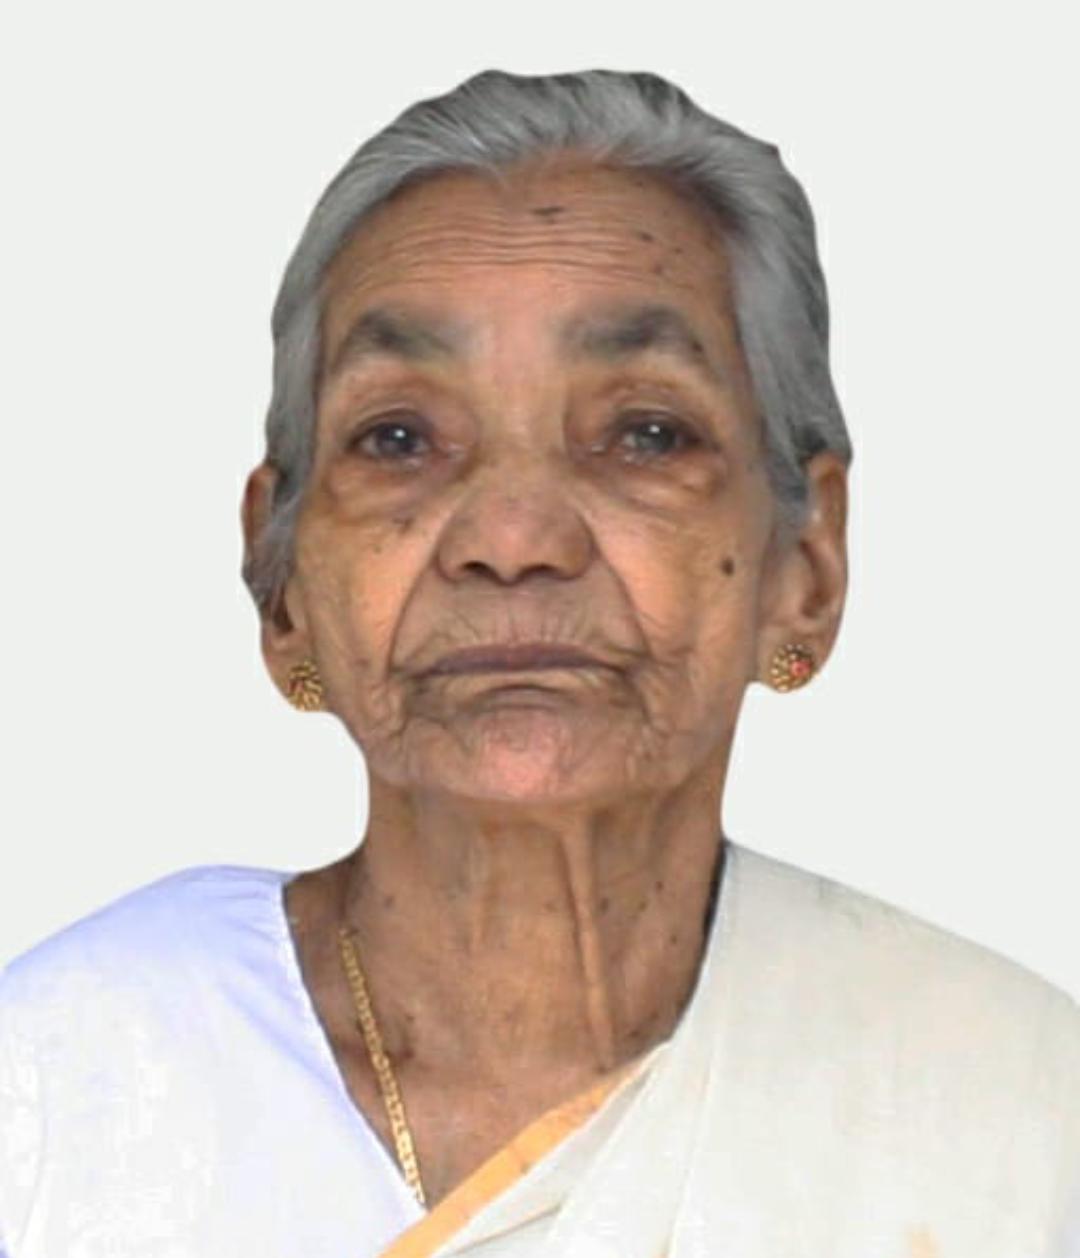 Photo of മാറാടി കാഞ്ഞിരക്കാട്ട് ഏലിയാമ്മ (90) അന്തരിച്ചു.